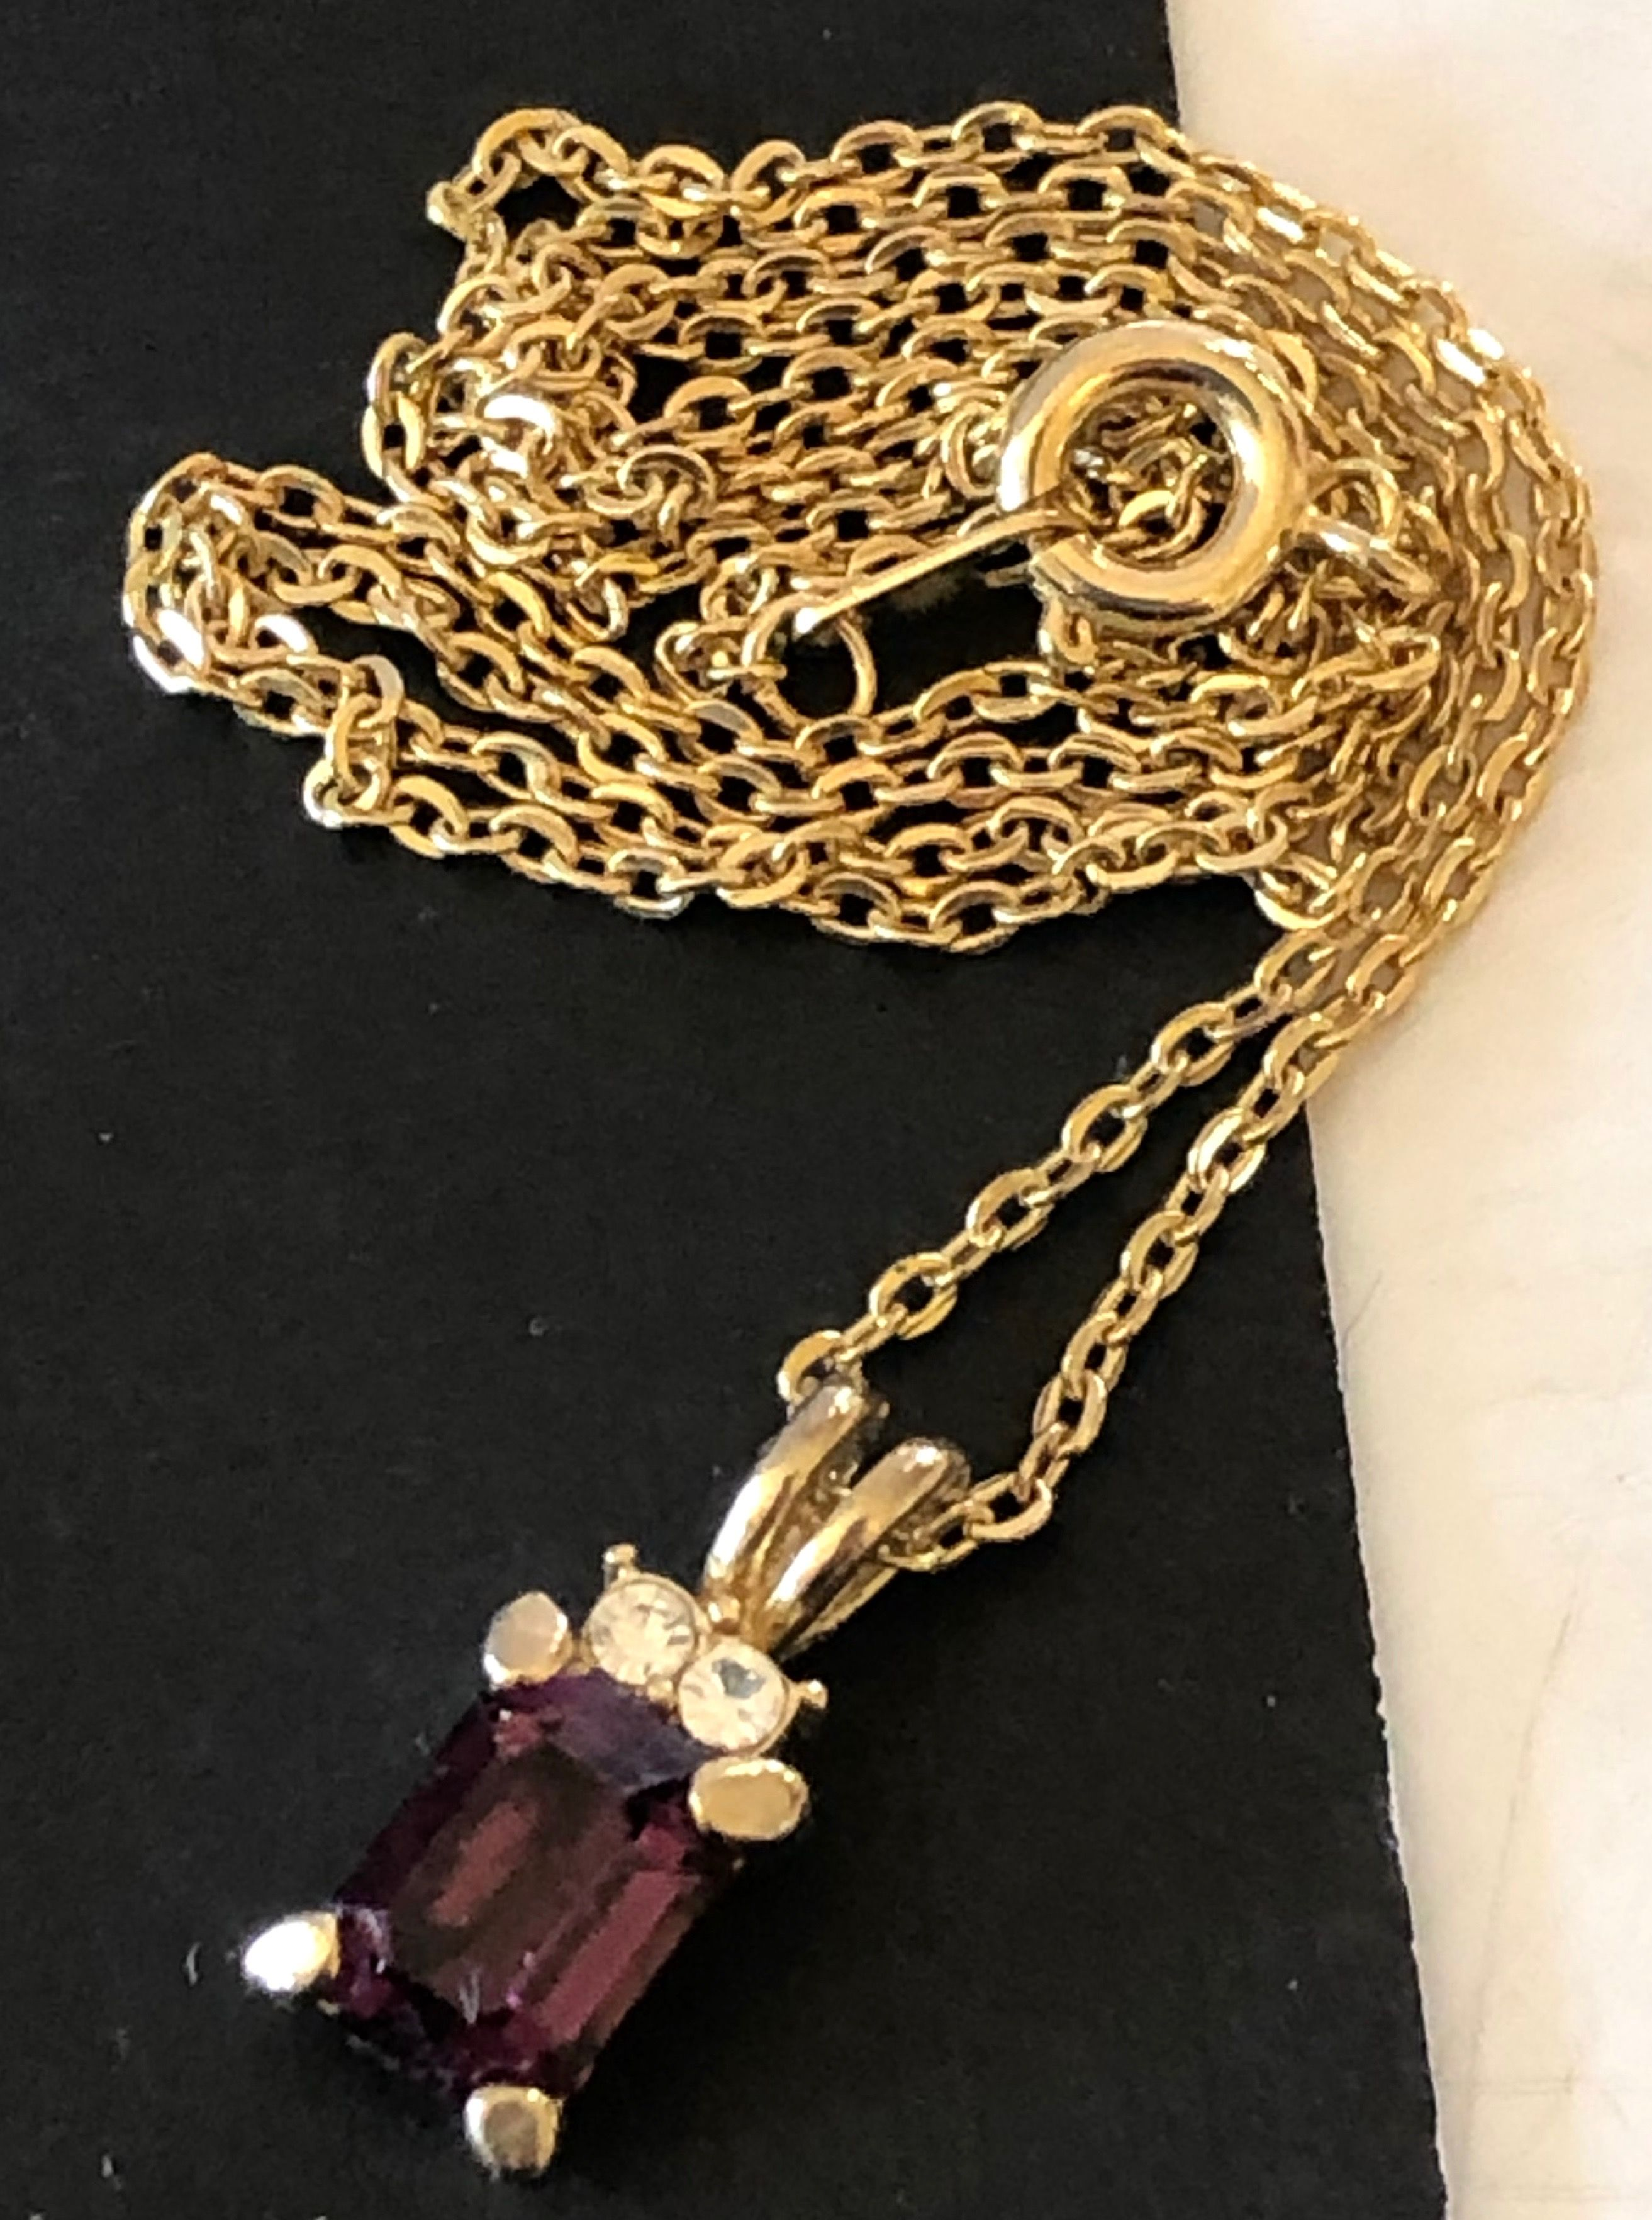 Image by Mychocolatelab on Jewelry I've Sold on EBay ...